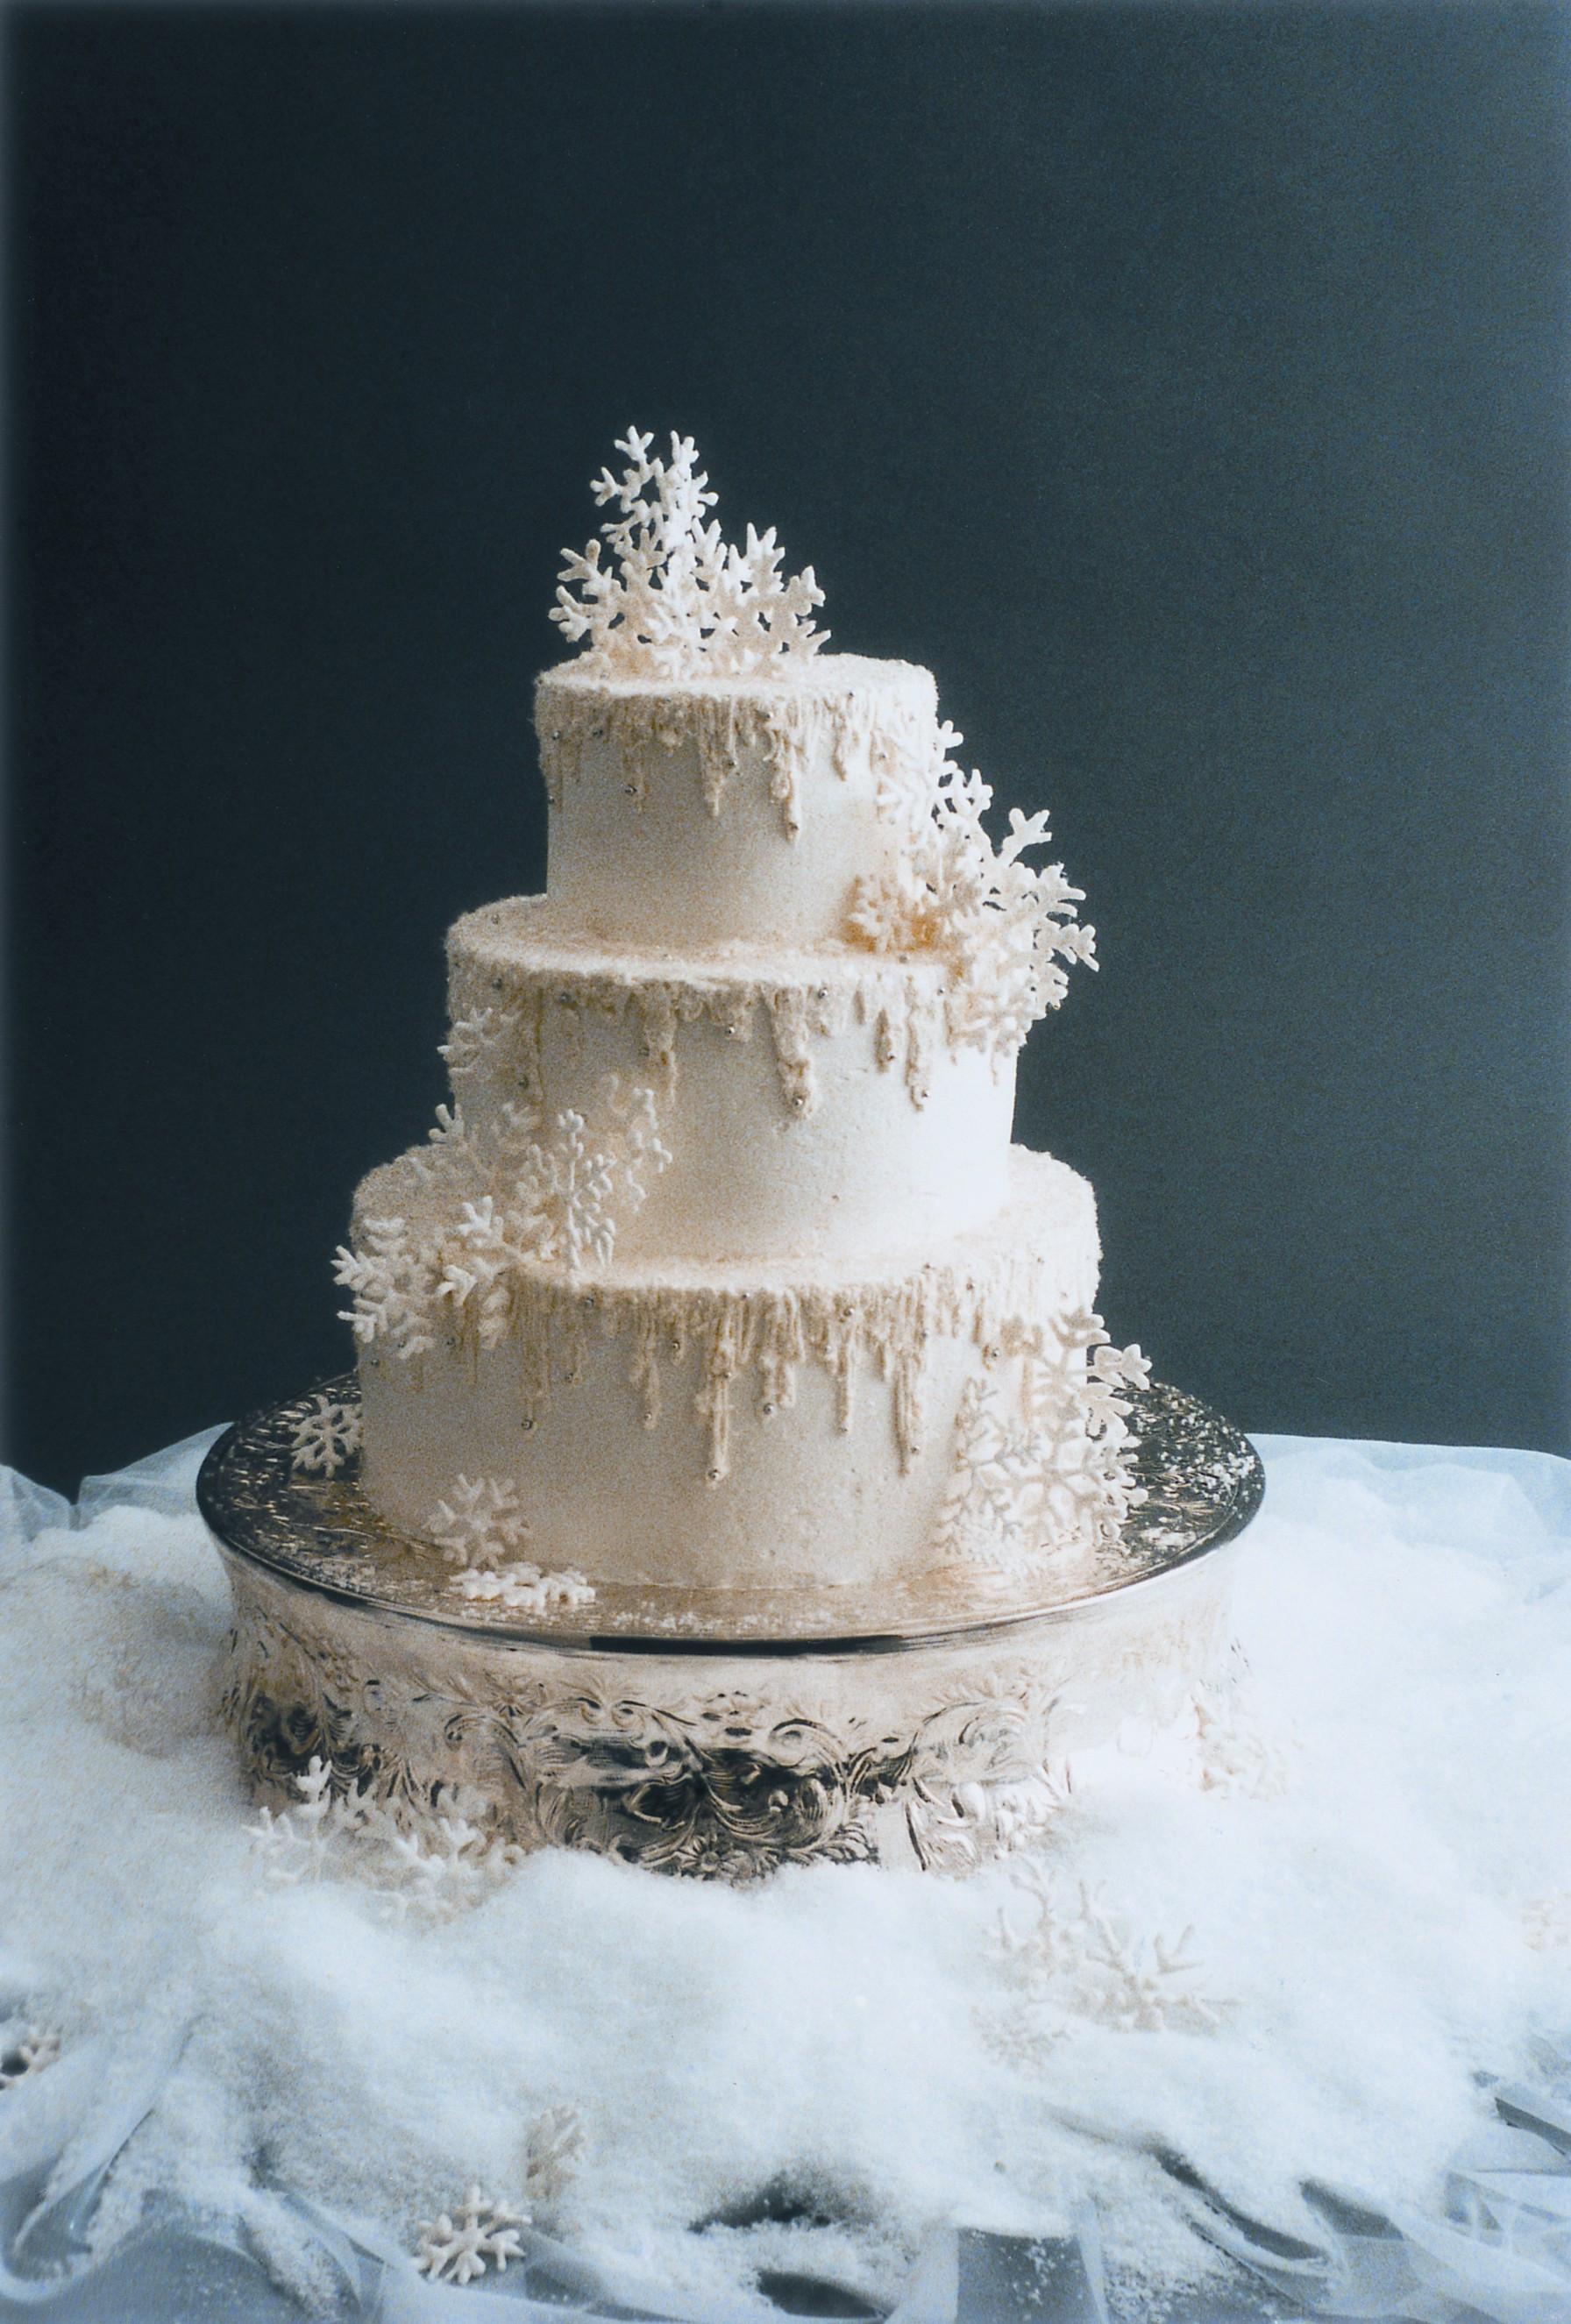 Snow Flake Wedding Cakes  Best Winter Wedding Decorations Ever